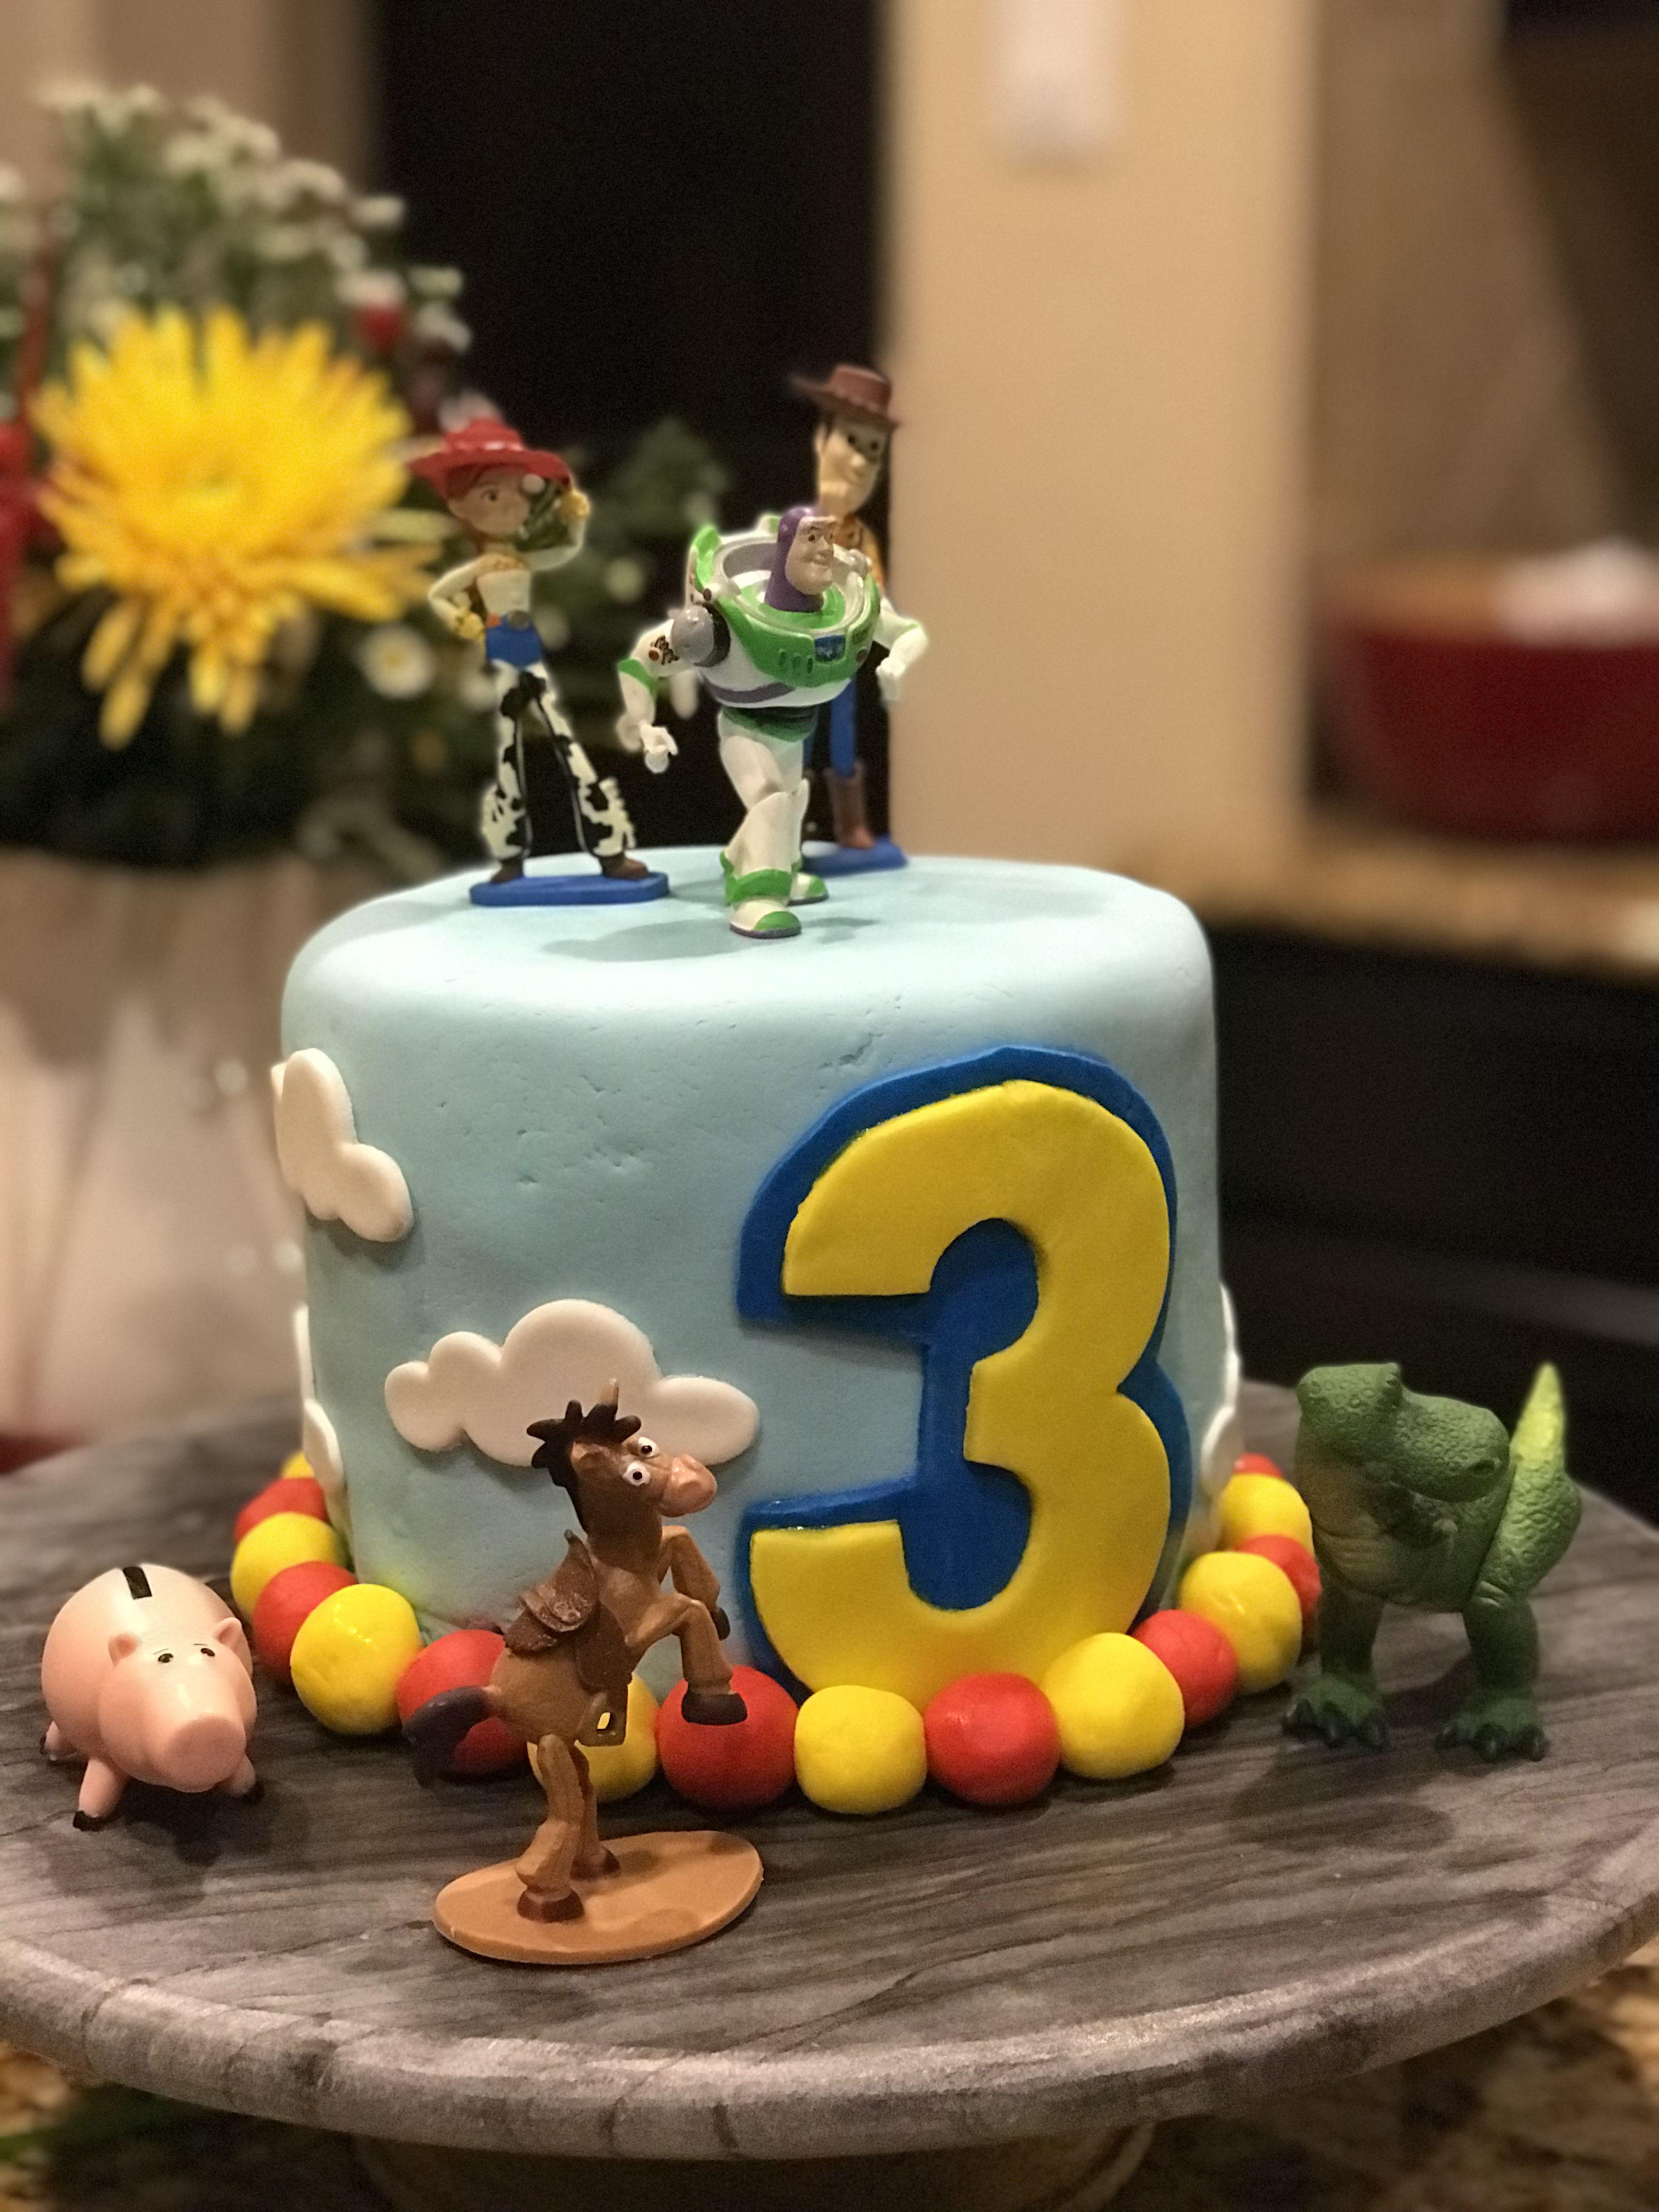 24+ Buzz lightyear cake decorations ideas